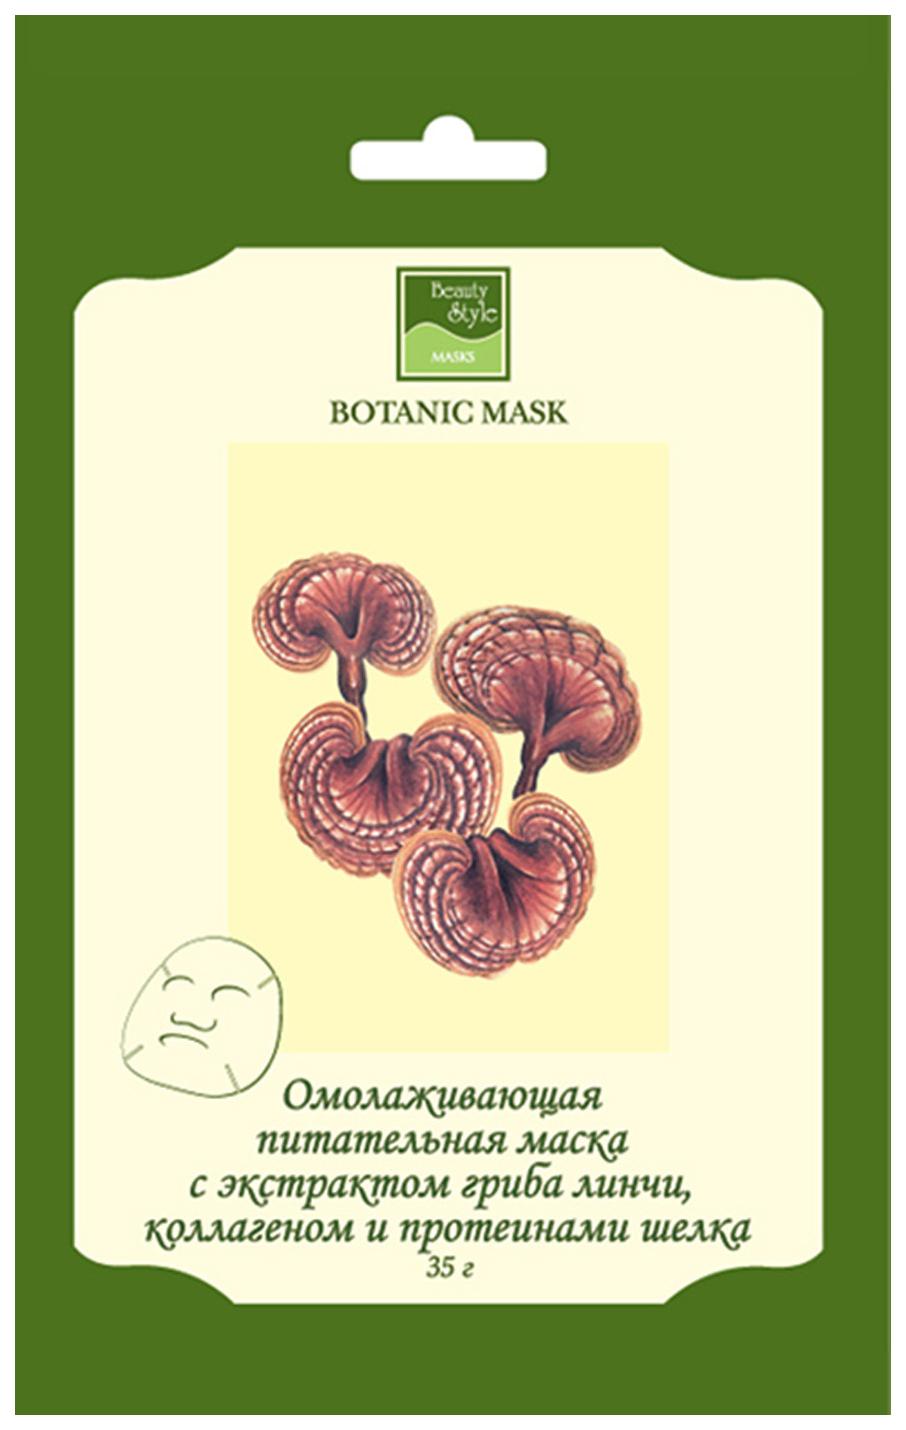 Маска Beauty Style с экстрактом гриба линчи, морским коллагеном и протеинами шелка, 1 шт